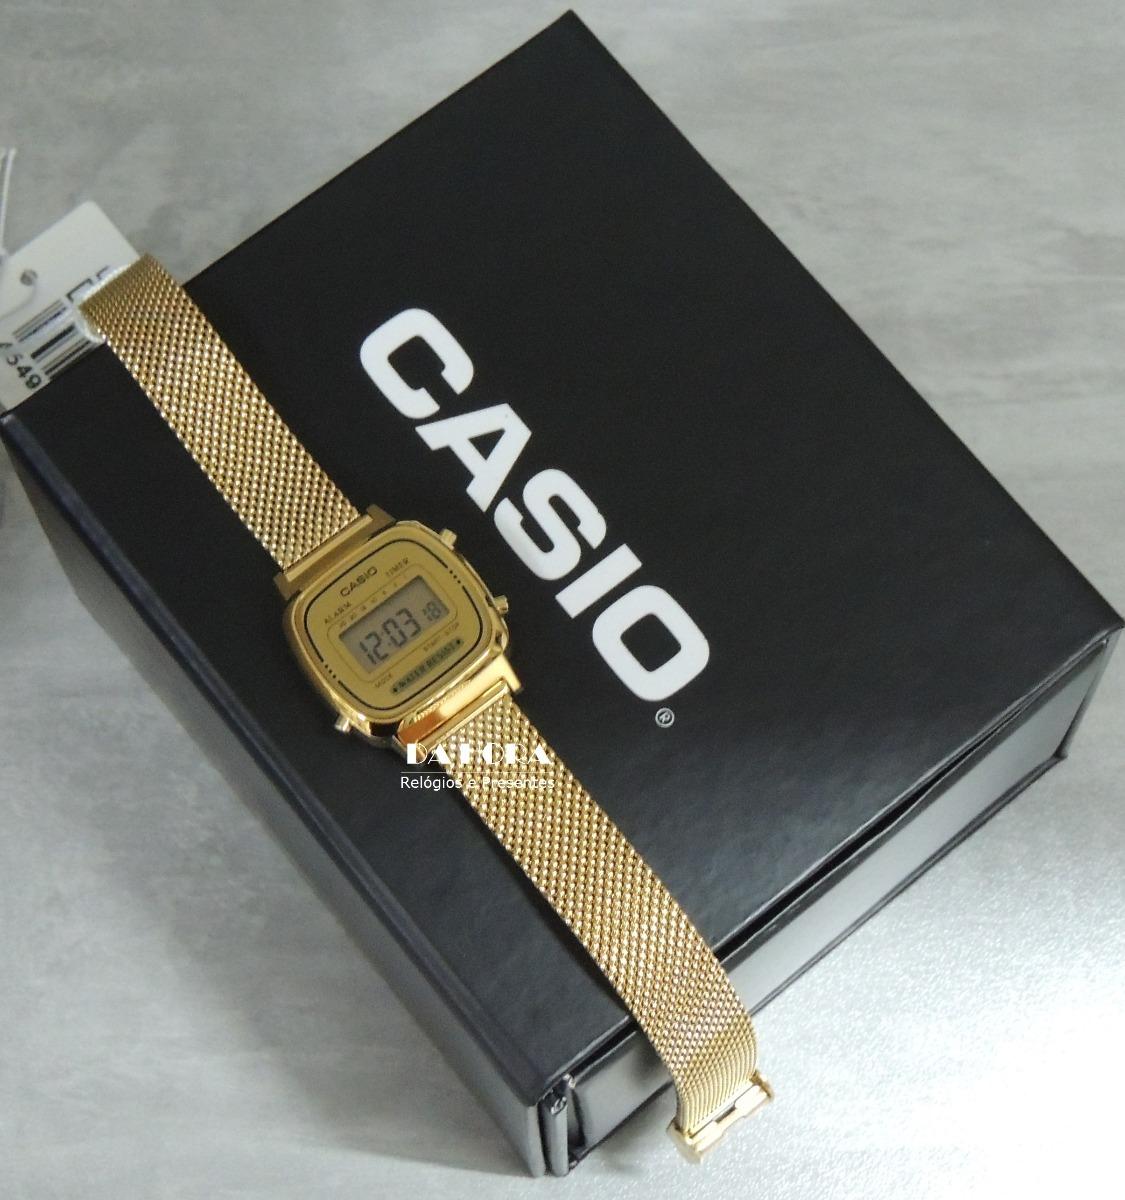 02627a0d19a relógio casio vintage mini - la670wemy-9df - lançamento nf. Carregando zoom.